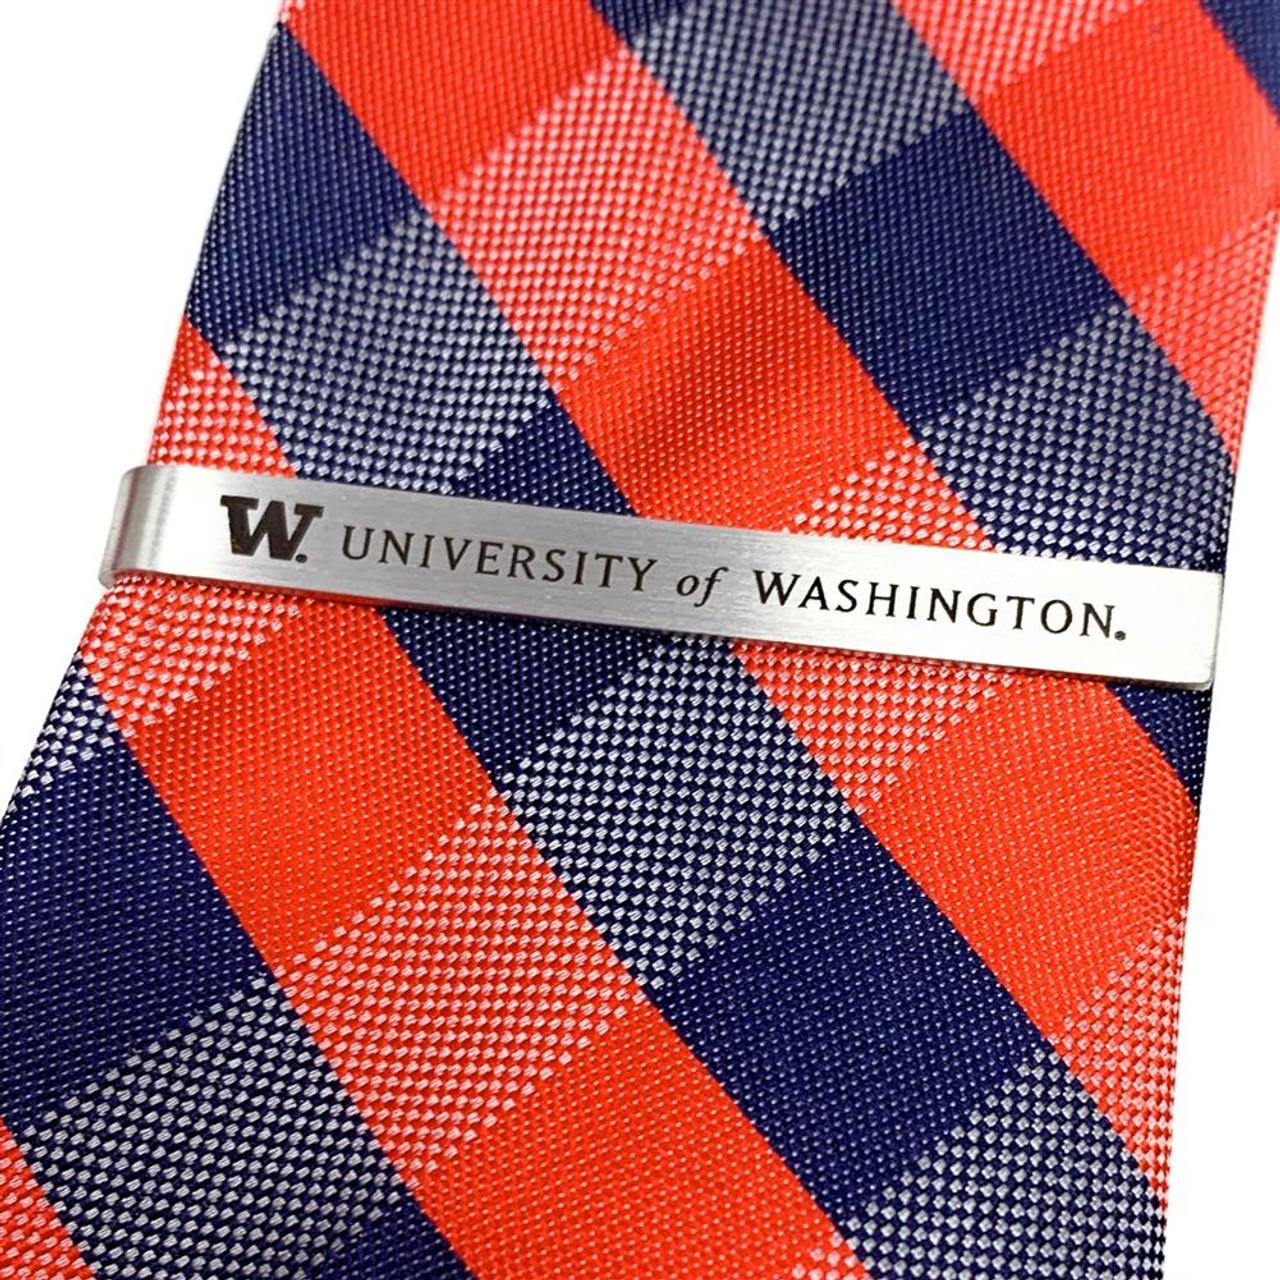 Naval Academy Navy Tie Clip Silver Tie Bar Gift Set